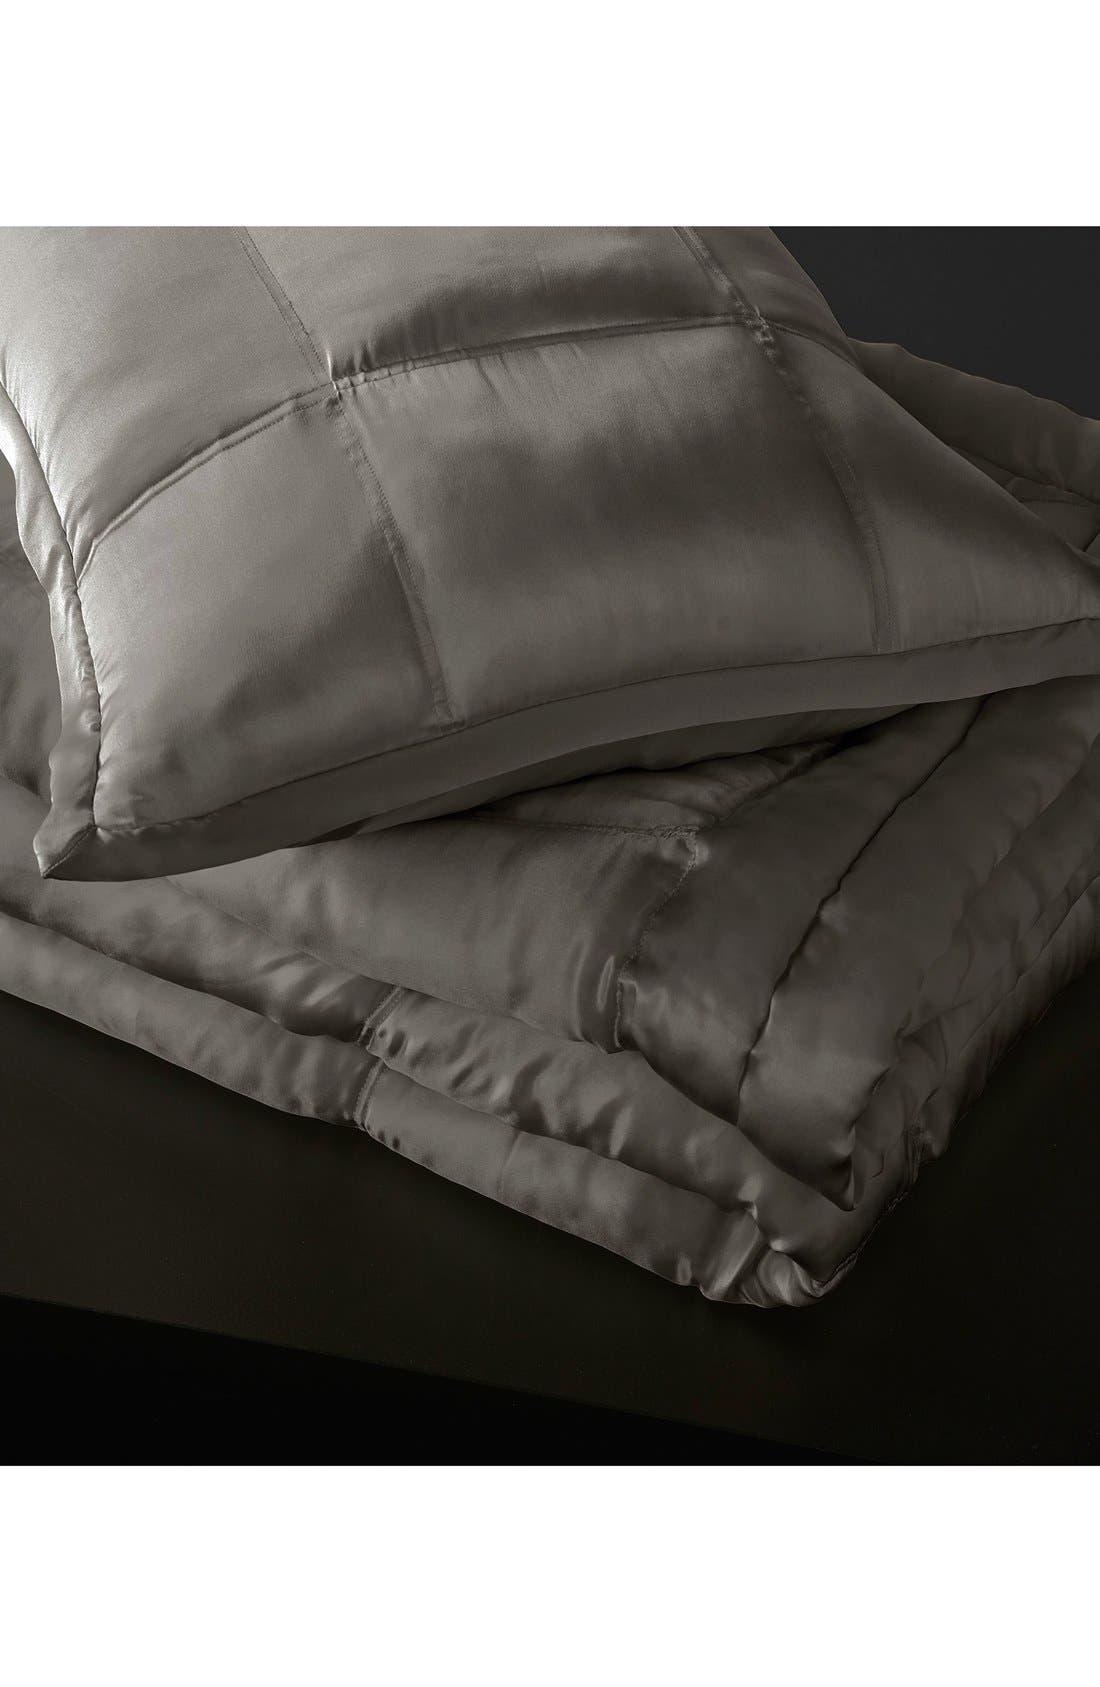 Donna Karan New York 'Surface' Silk Charmeuse Quilt & Shams